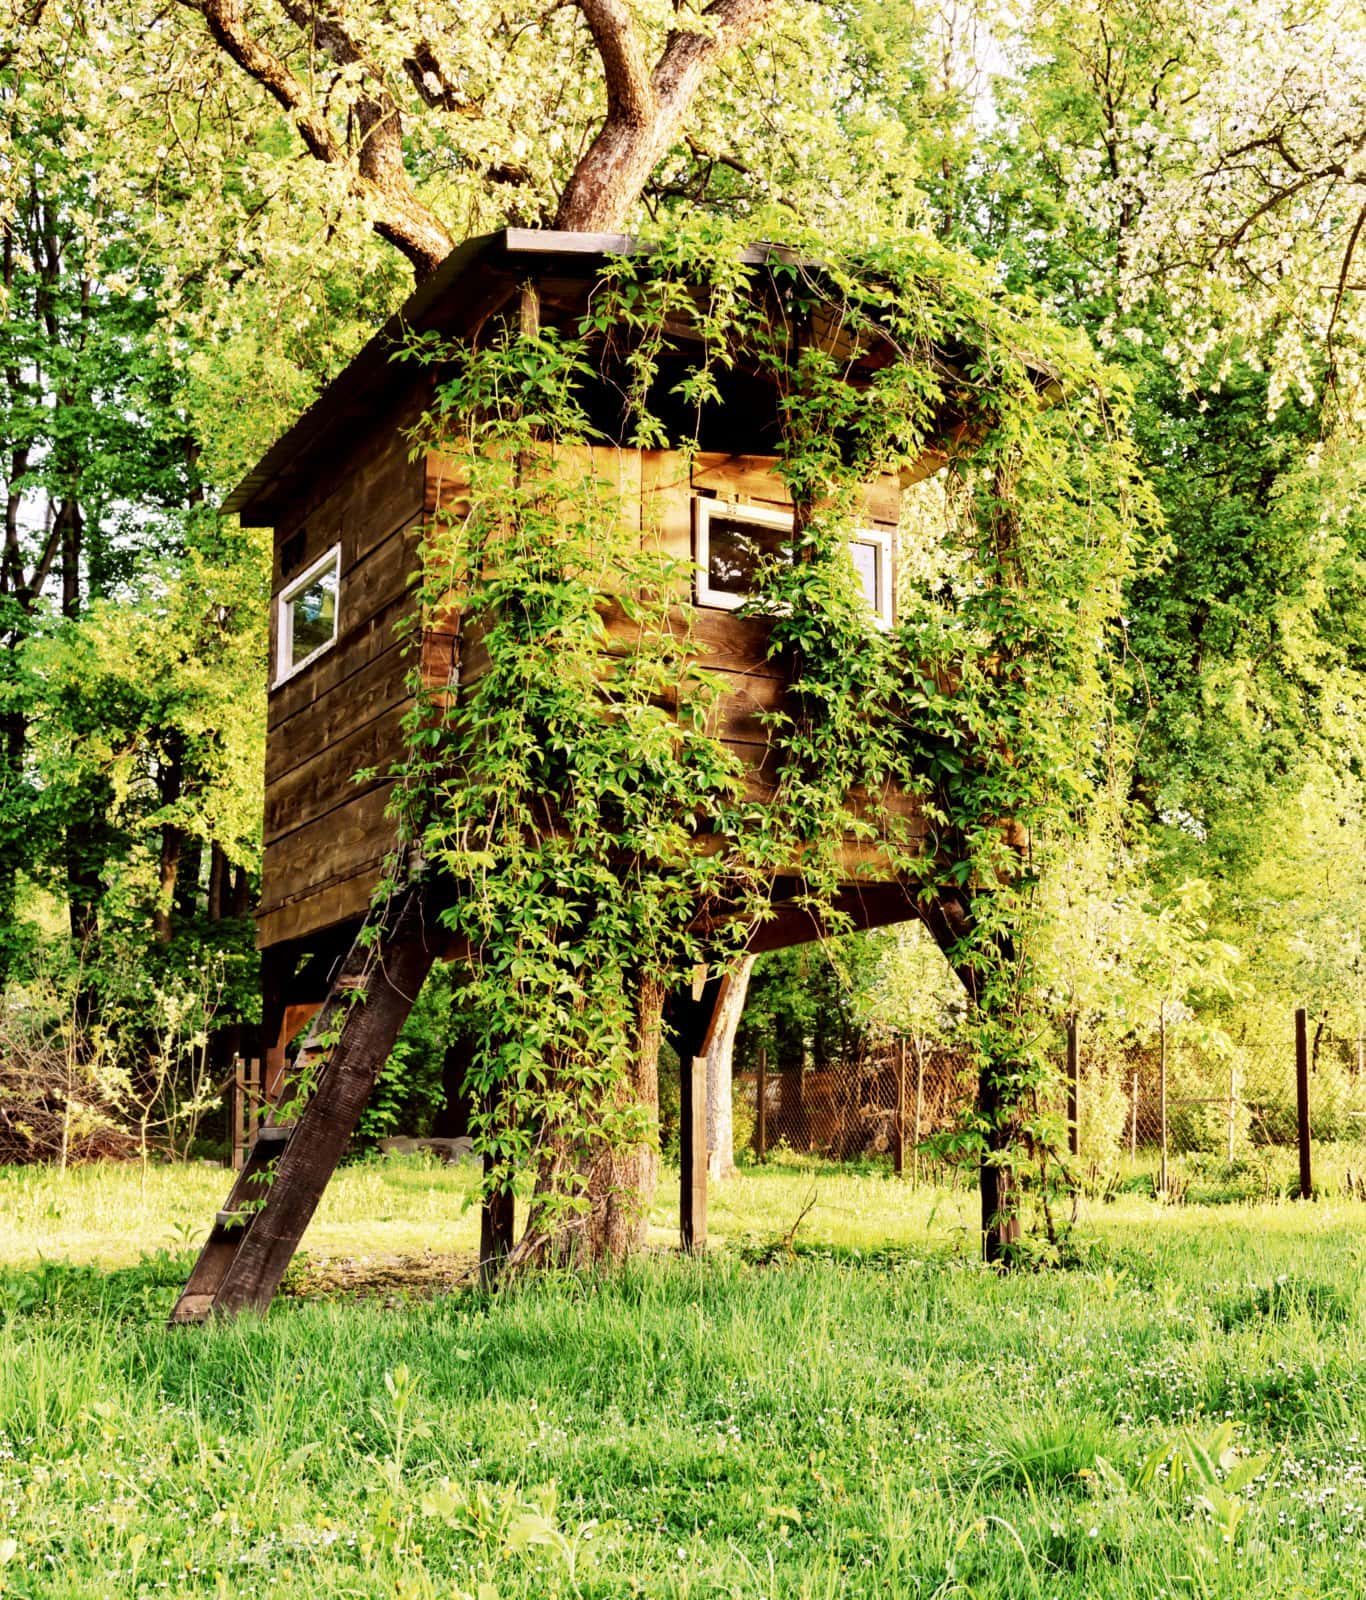 Treehouse built around a tree